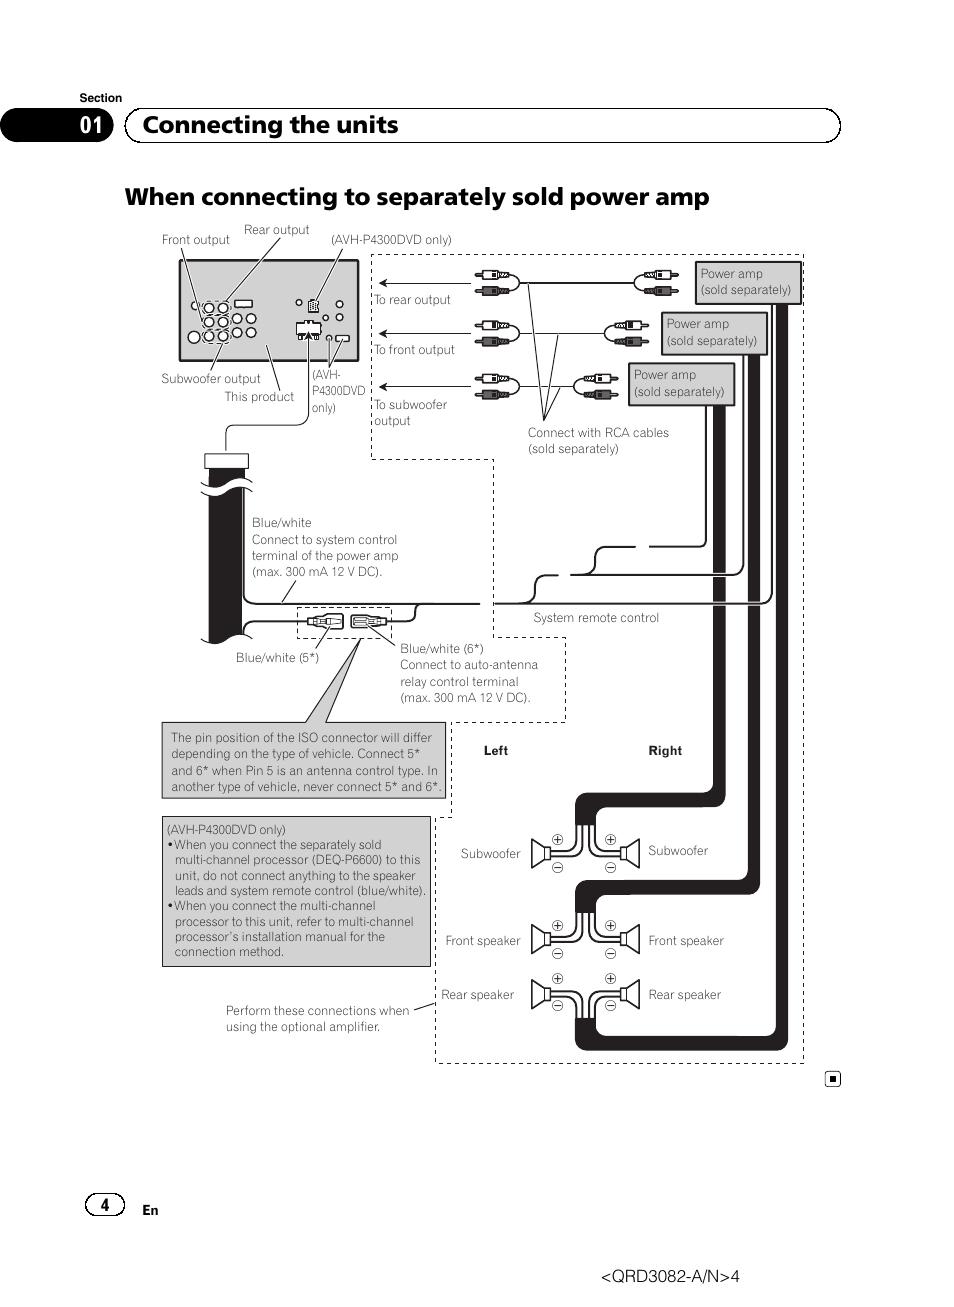 pioneer avh p4300dvd page4?resize\\\\\\\\\\\\\\\\\\\\\\\=665%2C911 whirlpool dryer wiring diagram 300 wiring diagrams whirlpool dryer schematic wiring diagram at bakdesigns.co